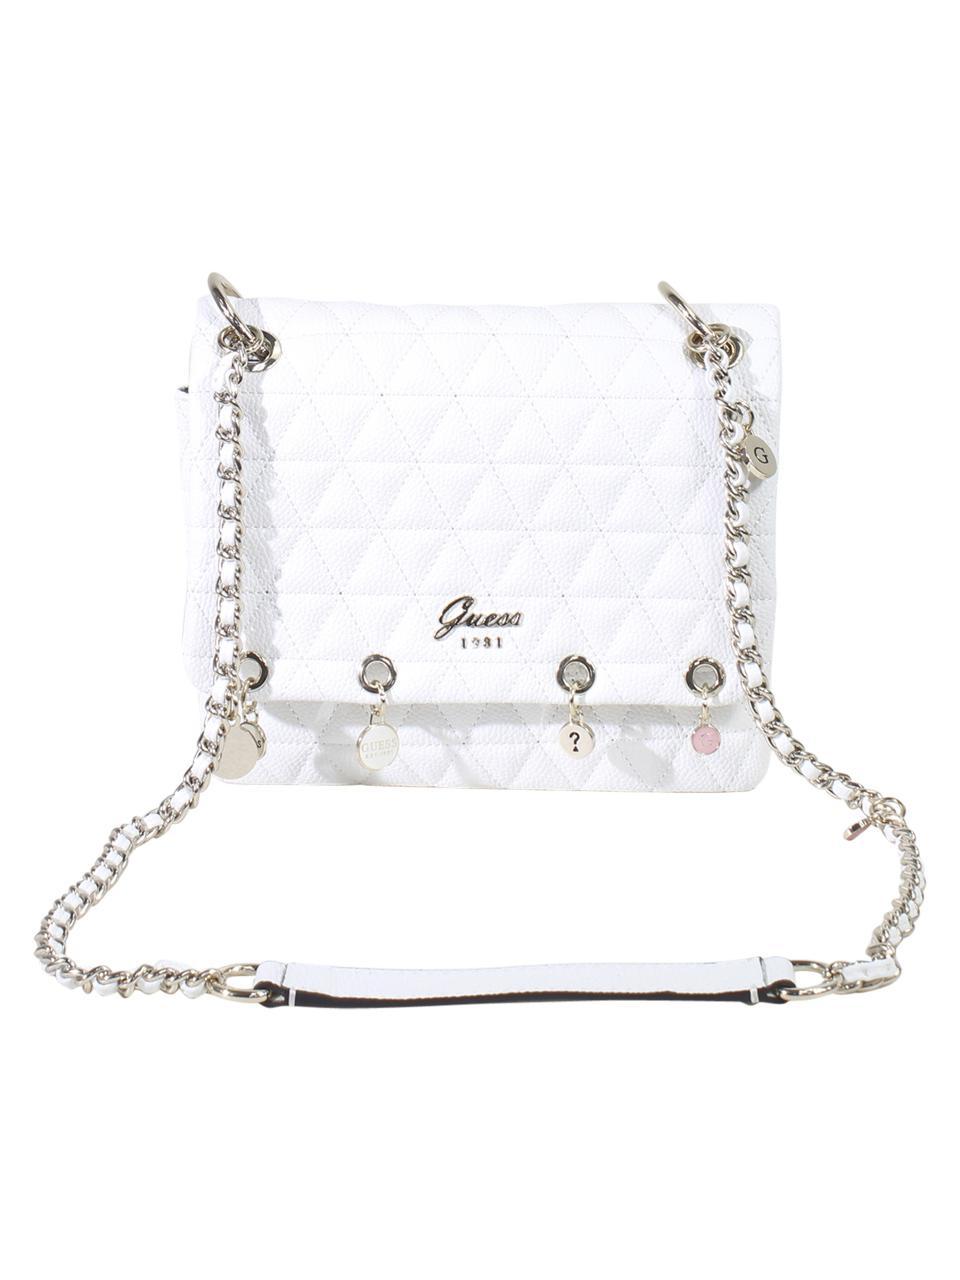 77cb291ec07 Guess Women s Fleur Charm Crossbody Handbag